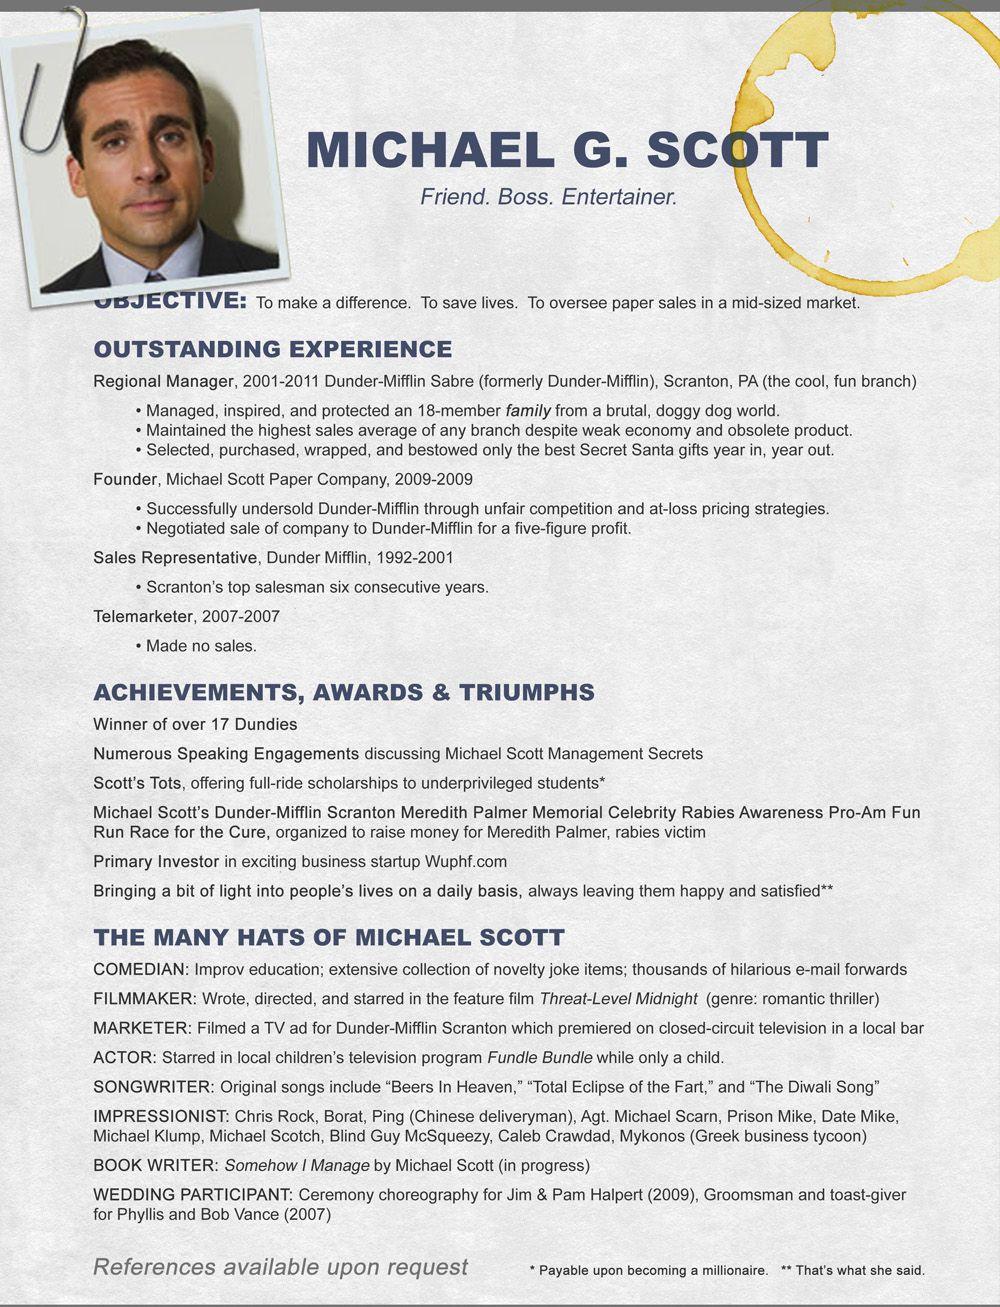 Michael Scott Cv The Office Michael Scott I Love To Laugh Bones Funny